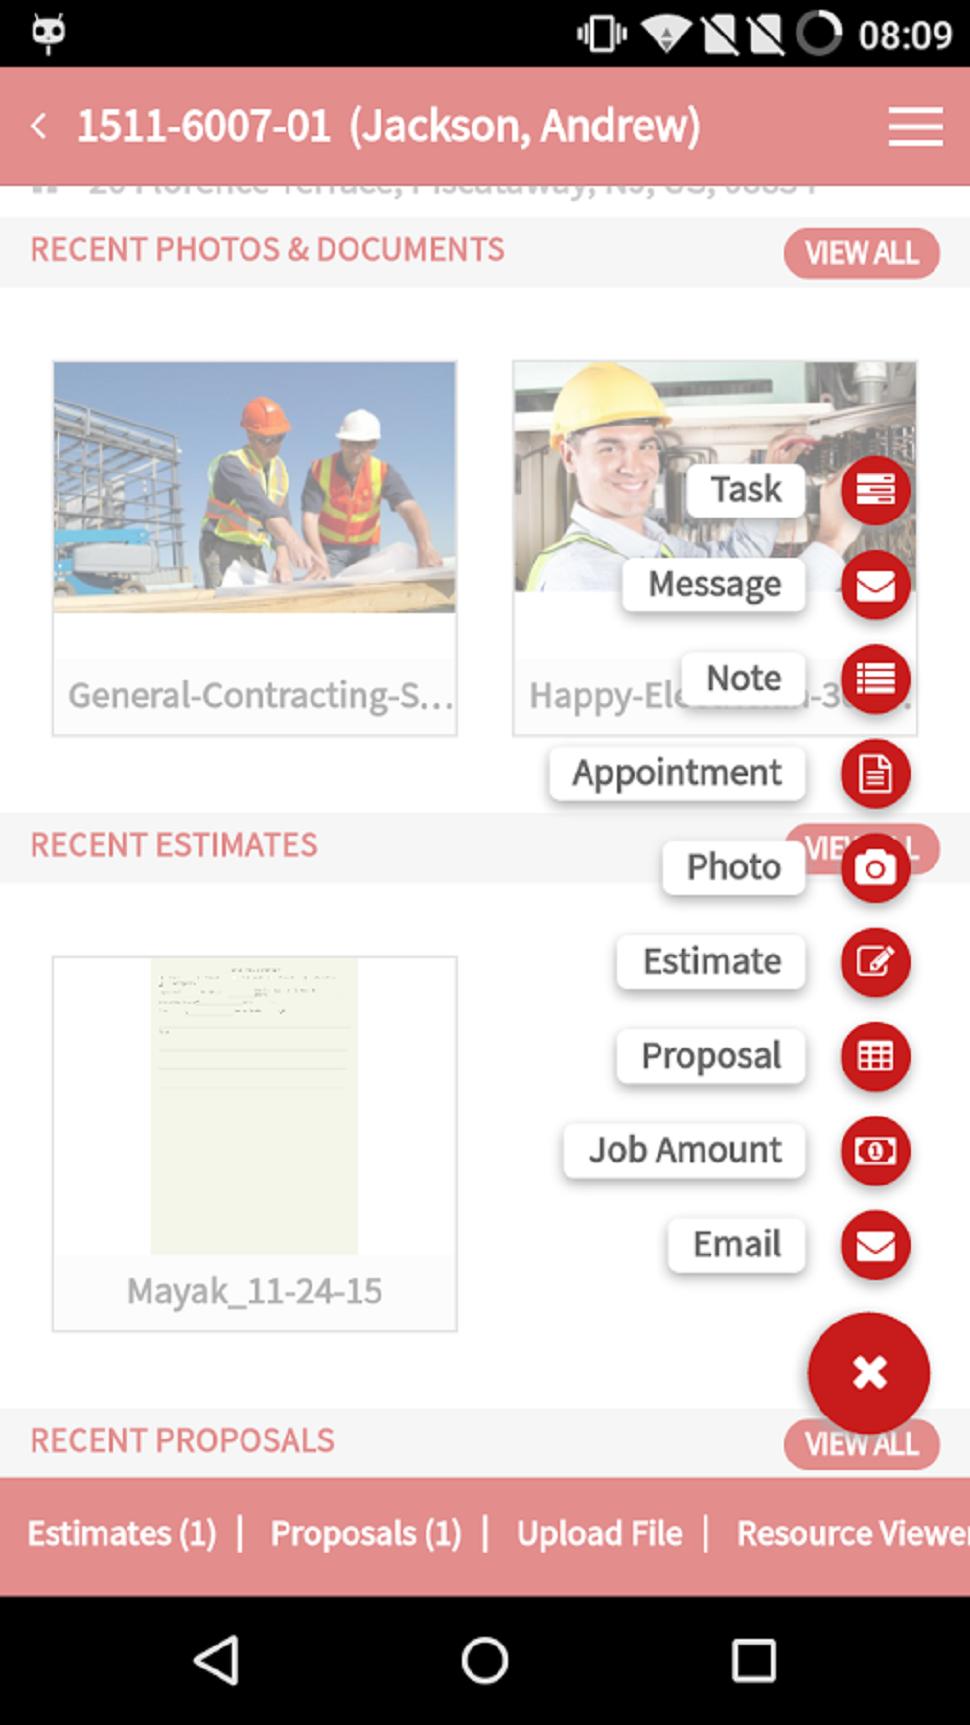 Mobile jobs screen